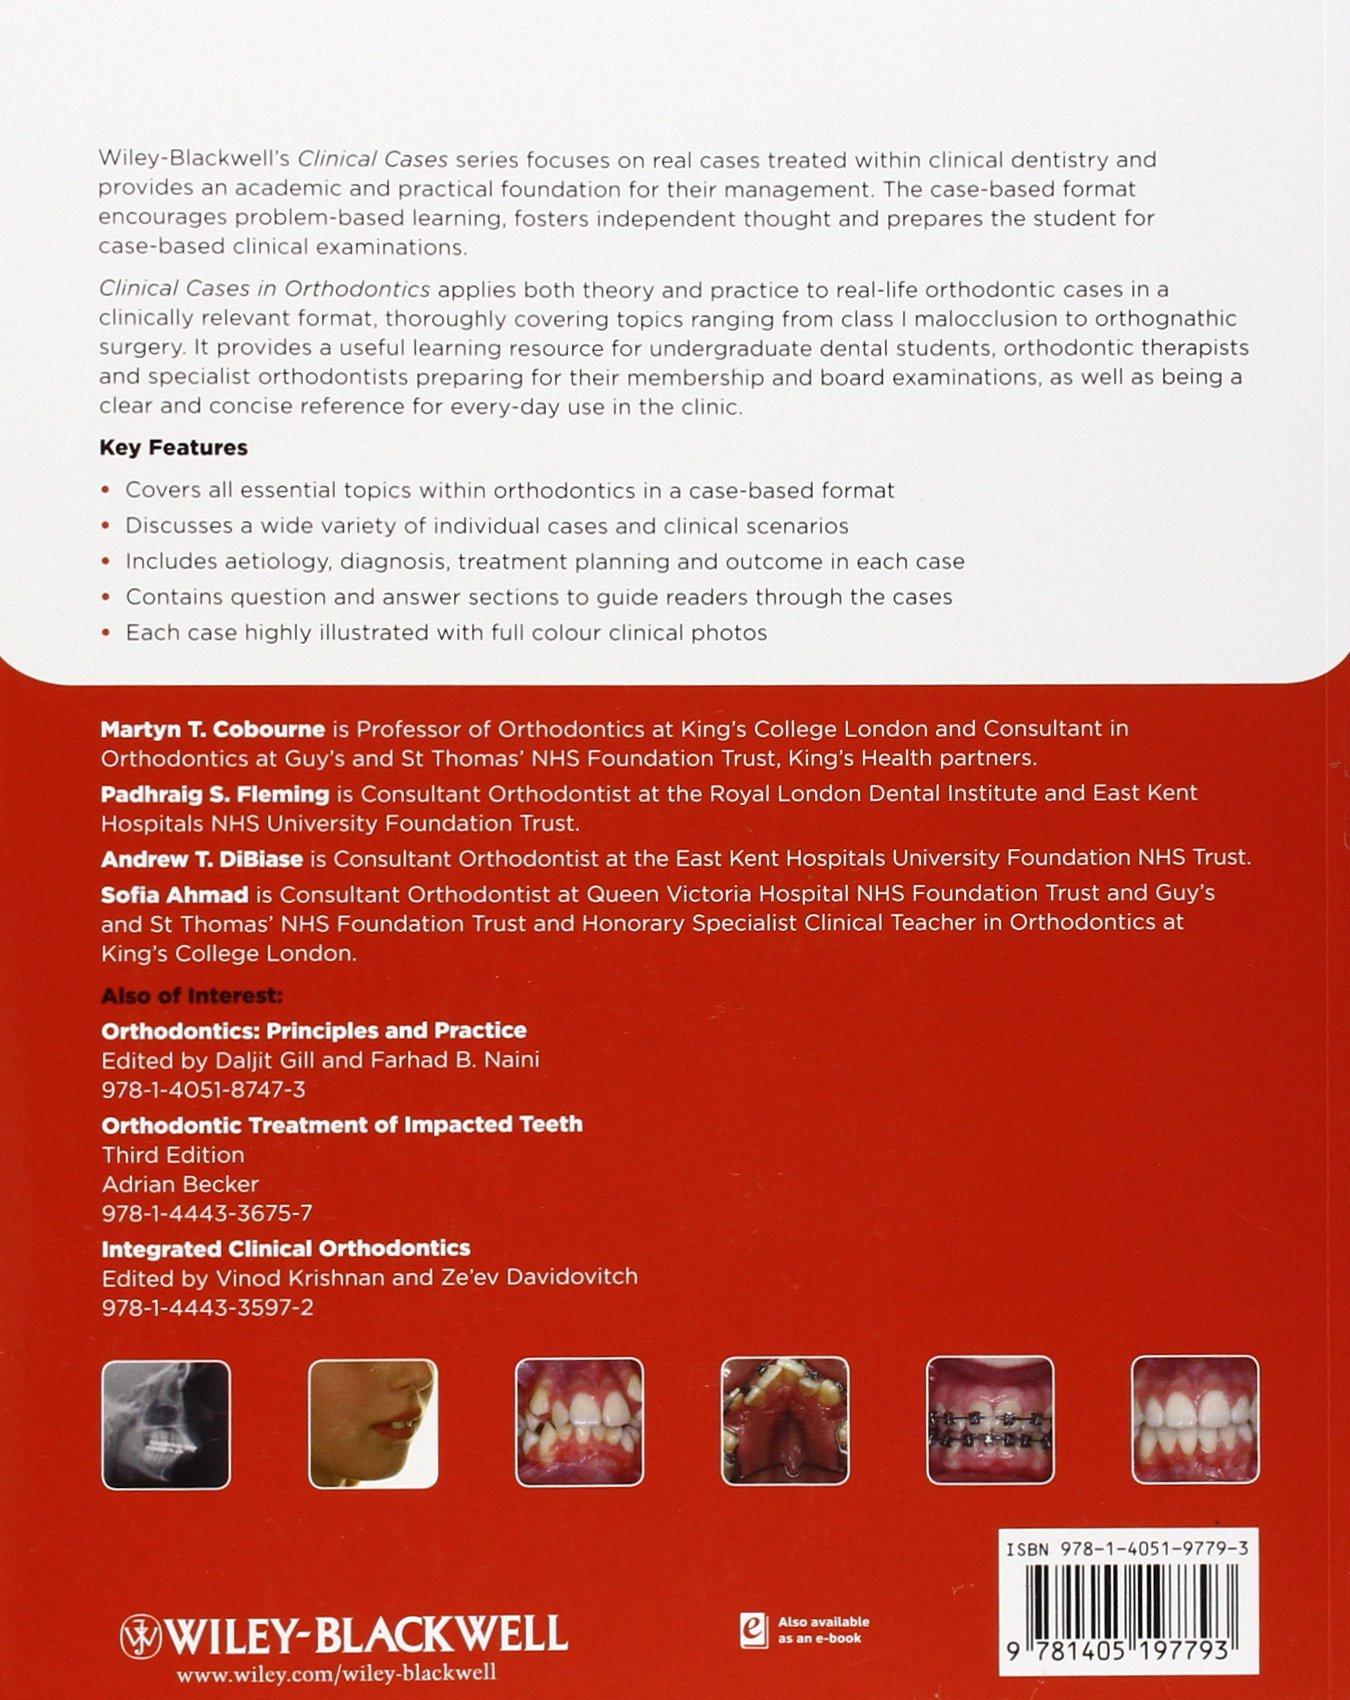 Clinical Cases in Orthodontics: Amazon.de: Martyn T. Cobourne, Padhraig S. Fleming, Andrew T. DiBiase, Sofia Ahmad: Fremdsprachige Bücher